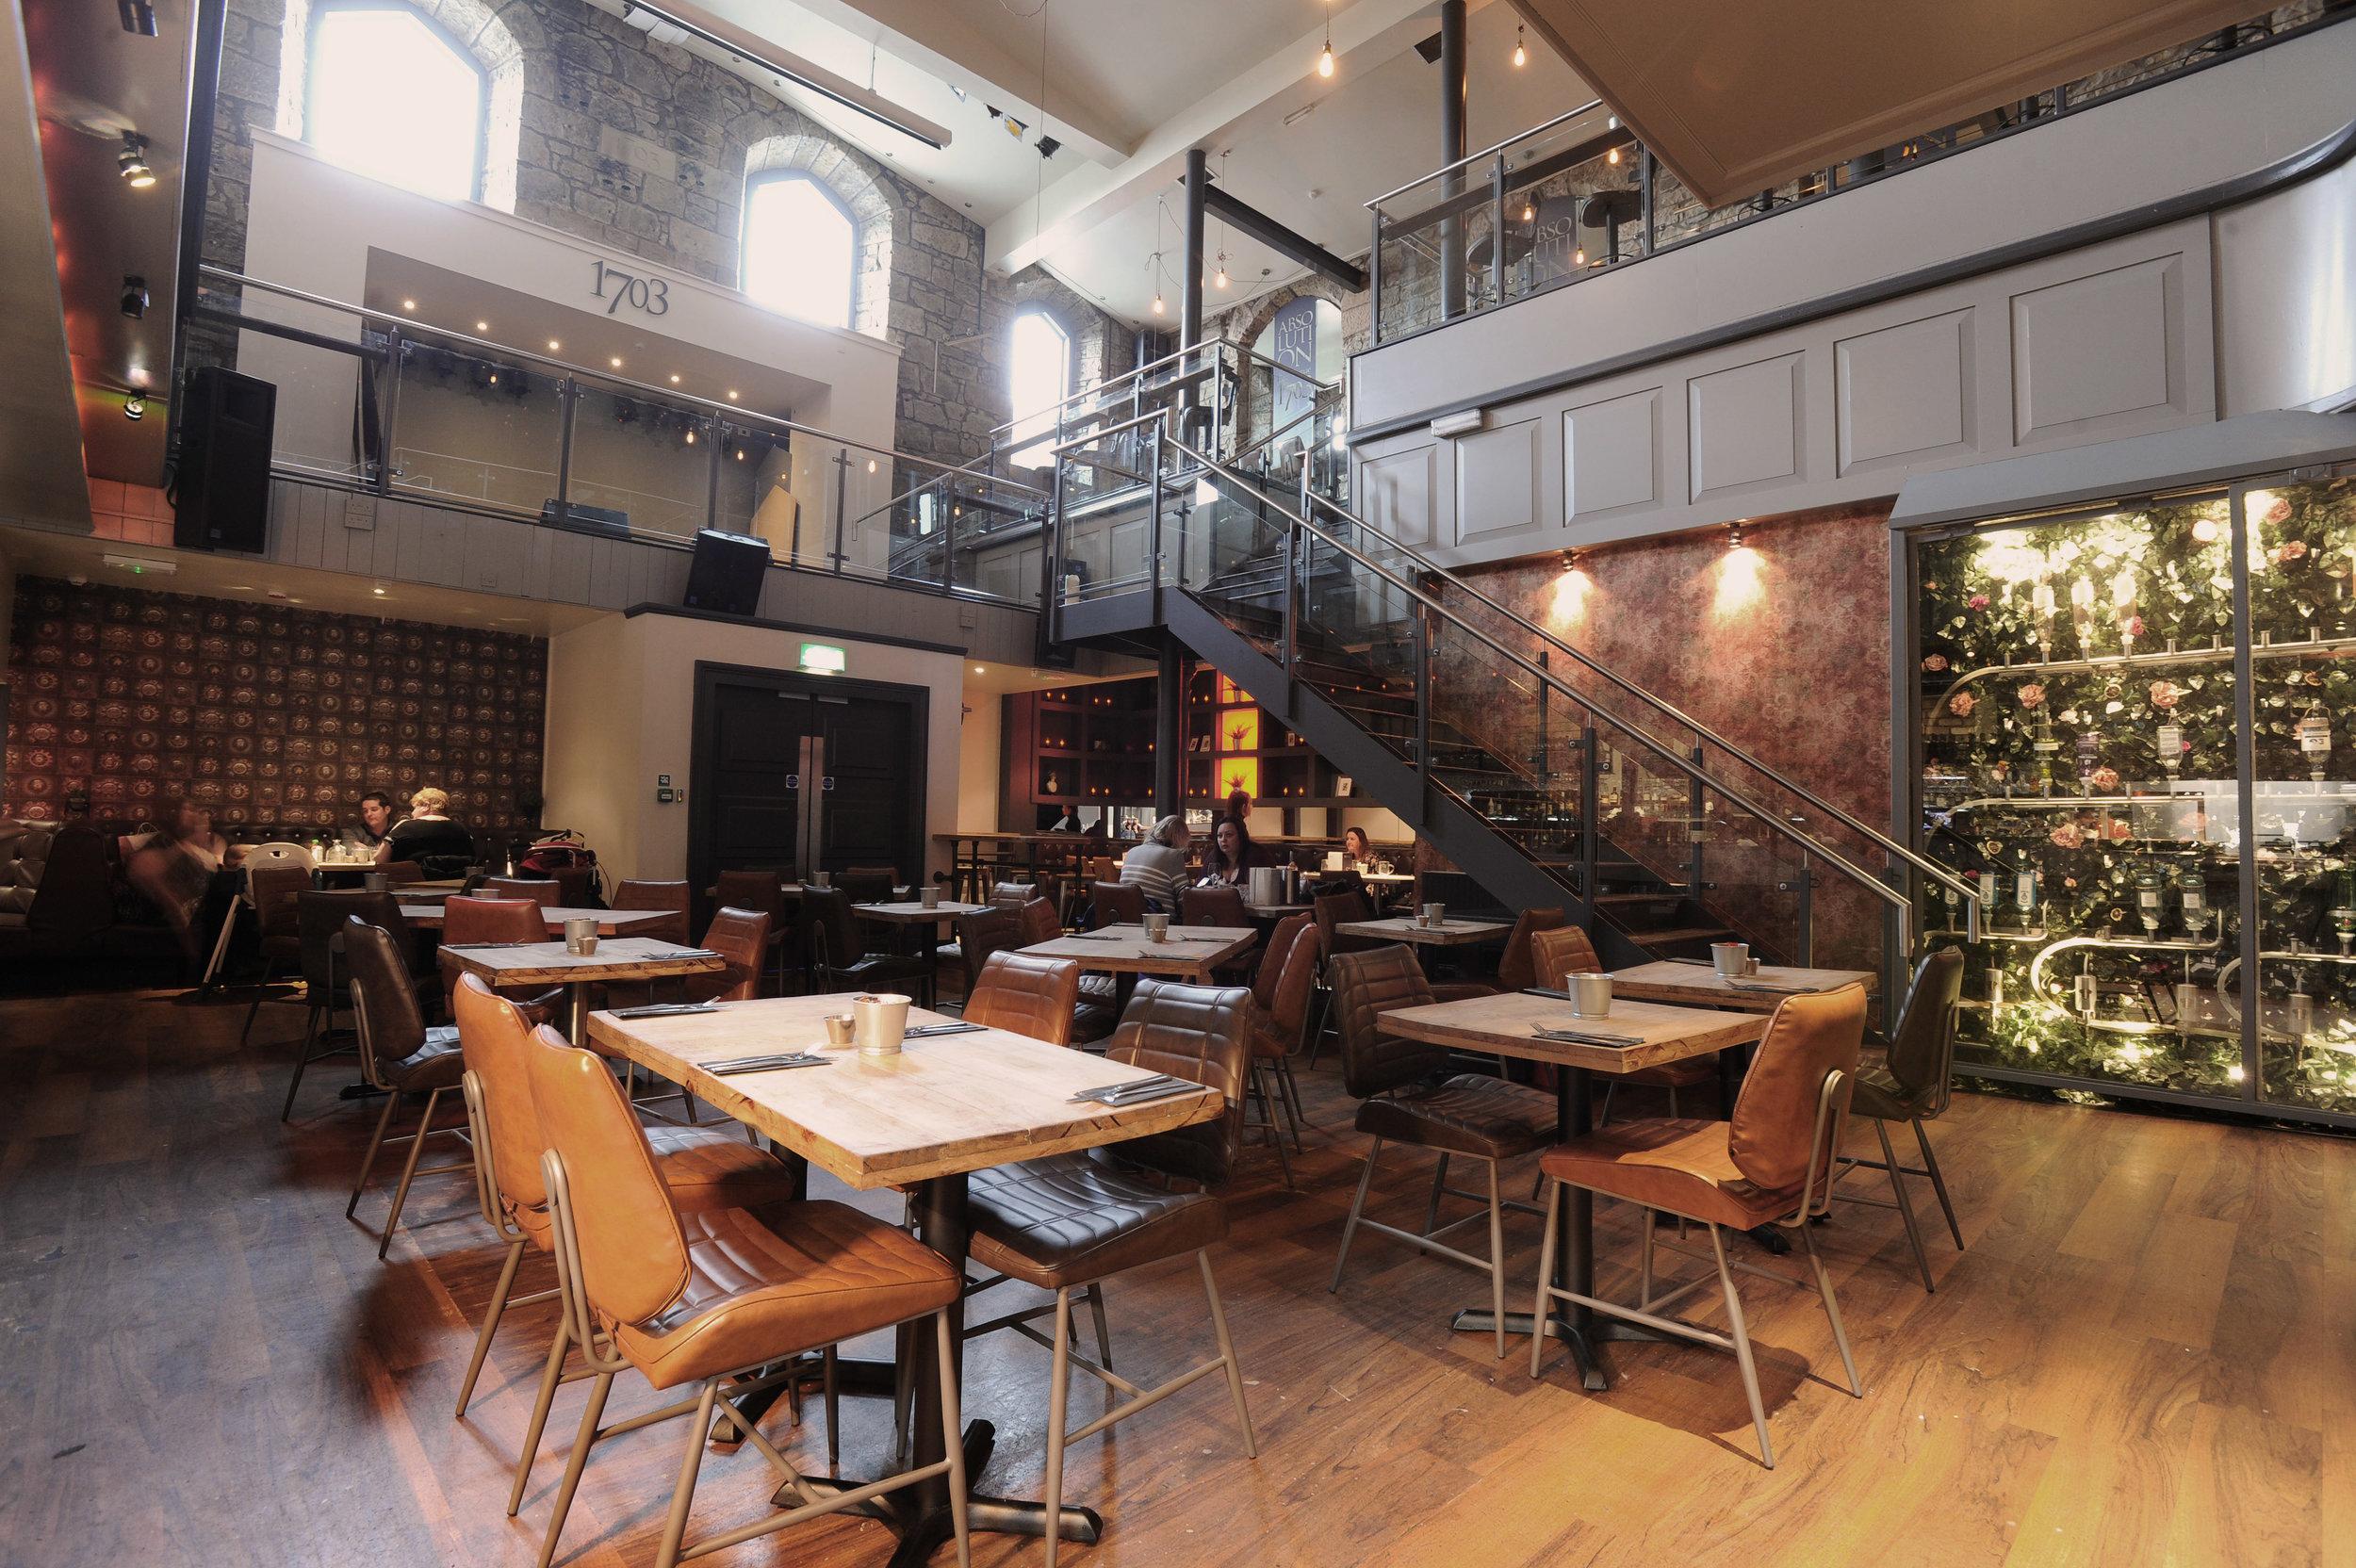 1703 dining area